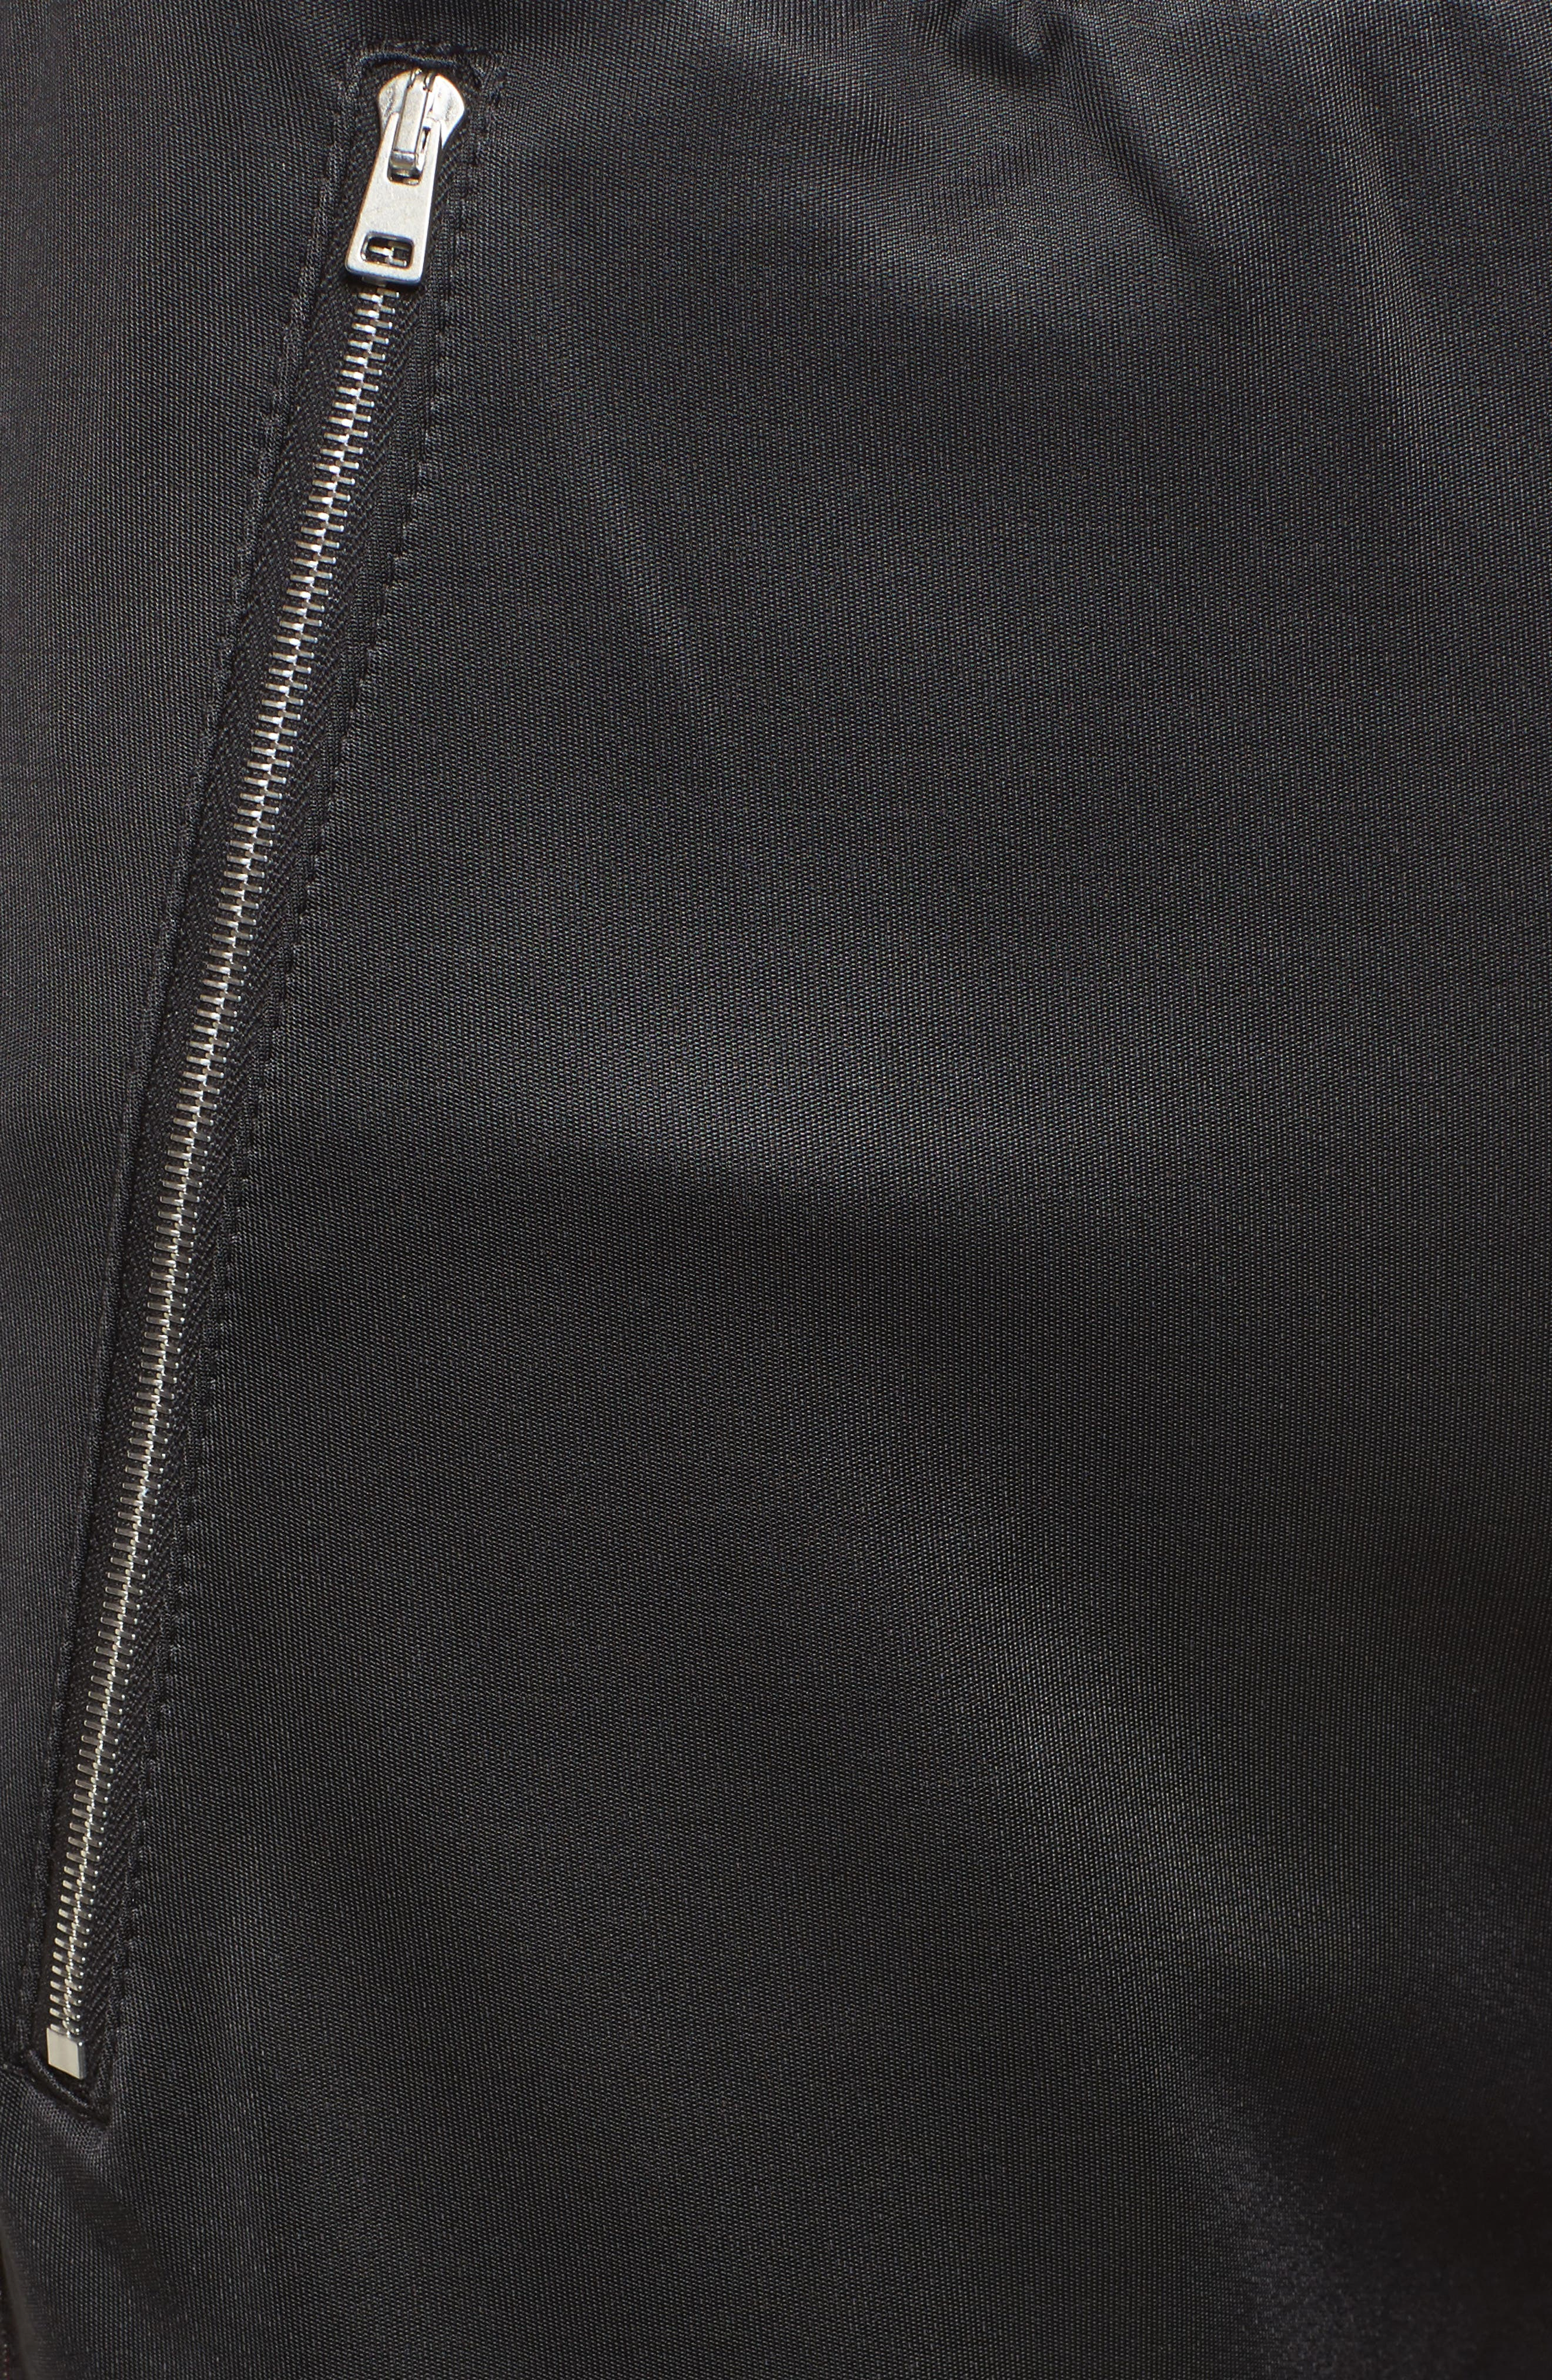 Slim Fit Track Pants,                             Alternate thumbnail 5, color,                             001